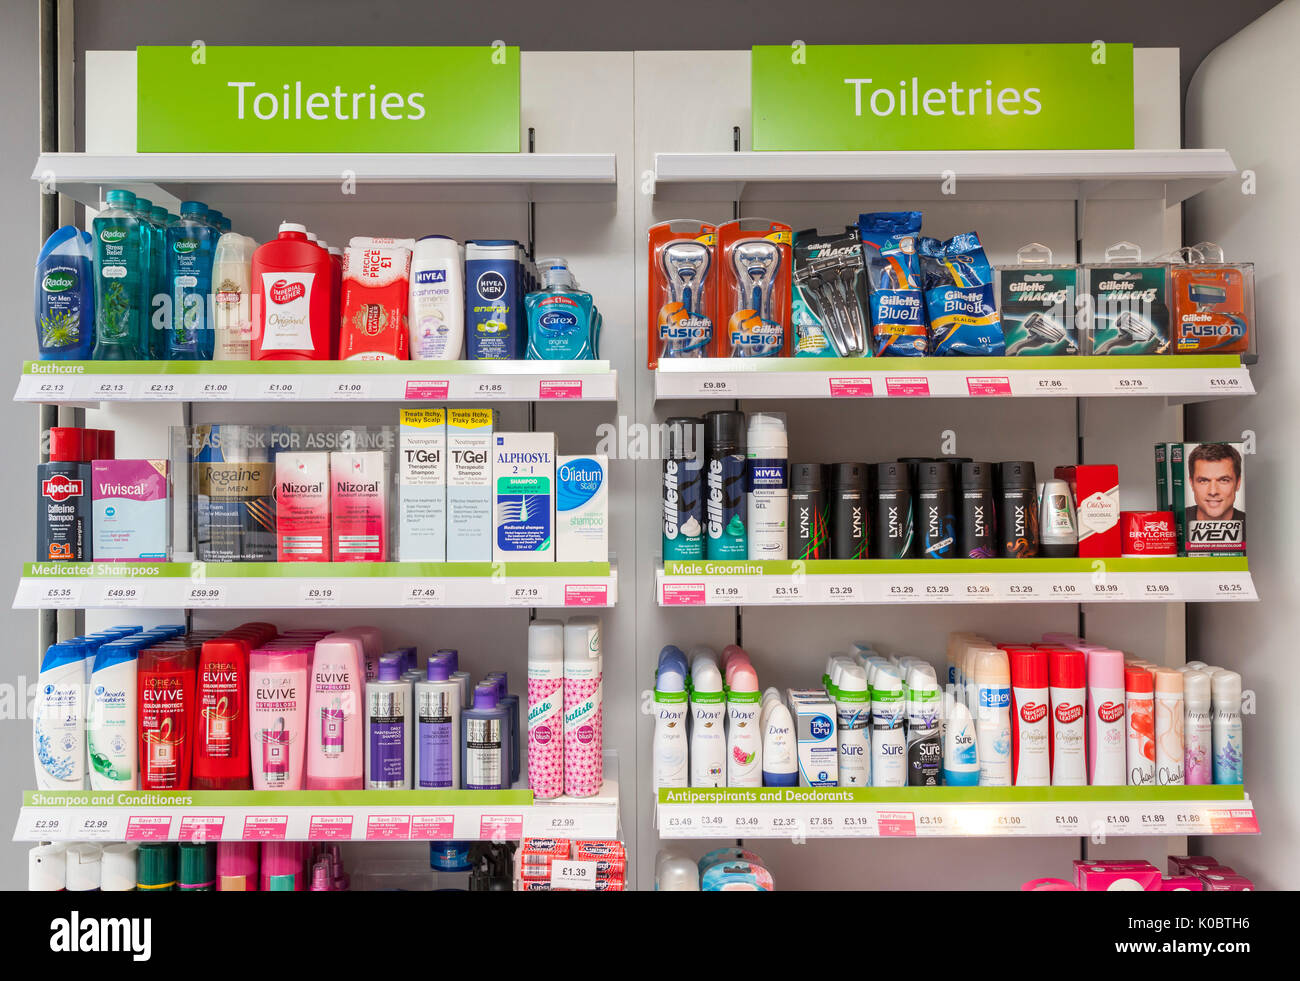 Toliteries on display in a chemist shop,pharmacy shelf,pharmacists,drug store - Stock Image